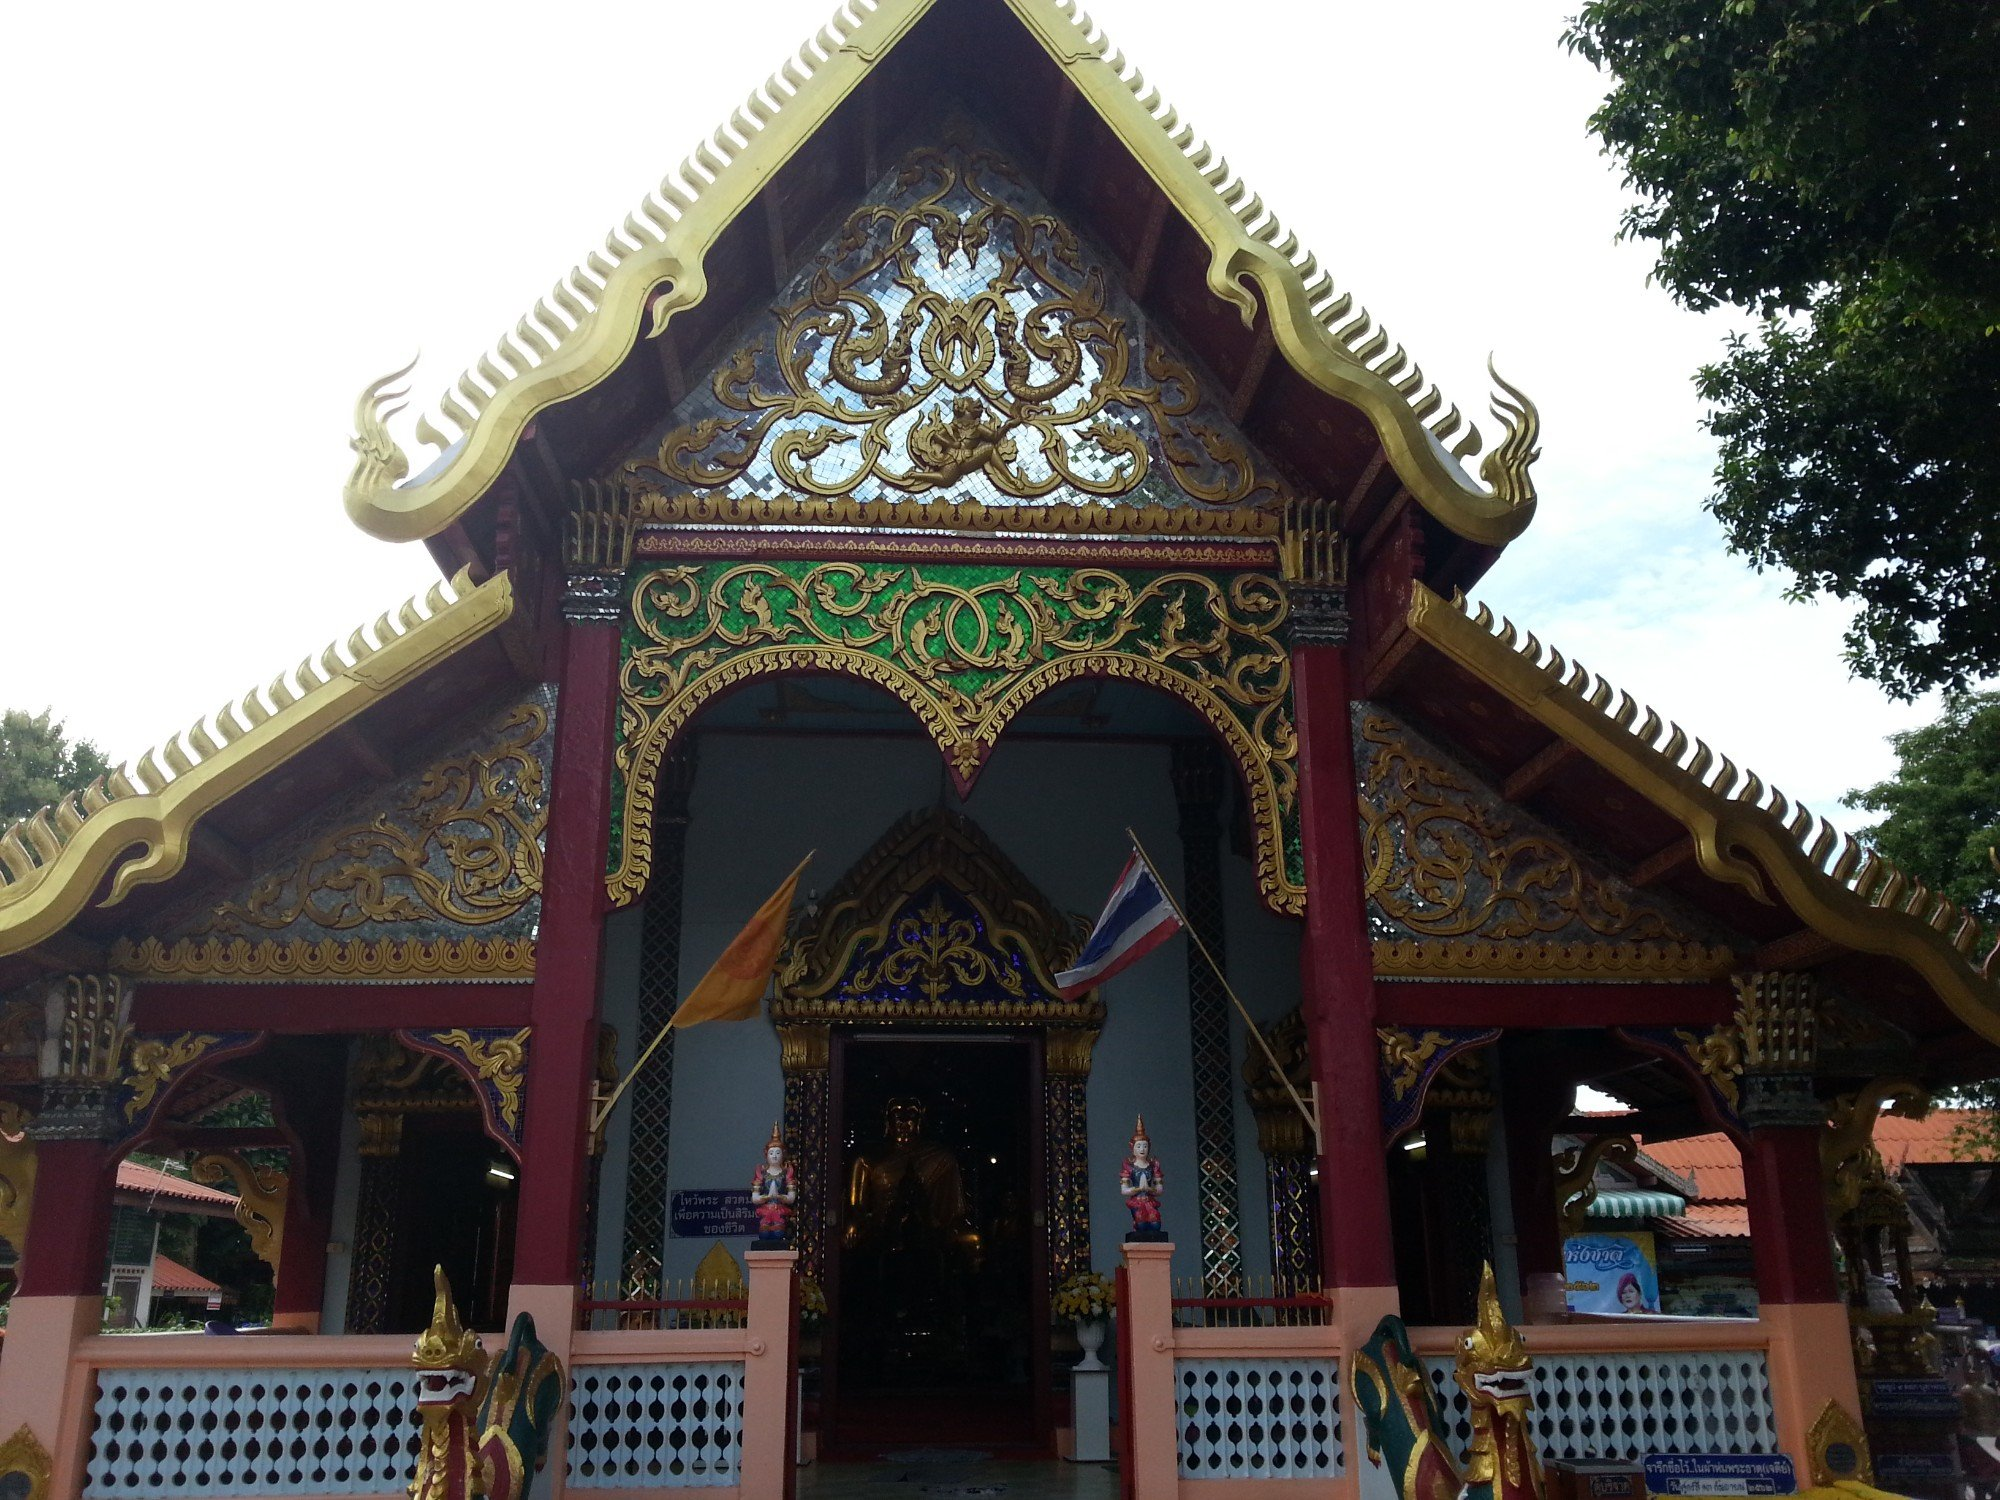 Front of the ordination hall at Wat Pratu Ton Phueng